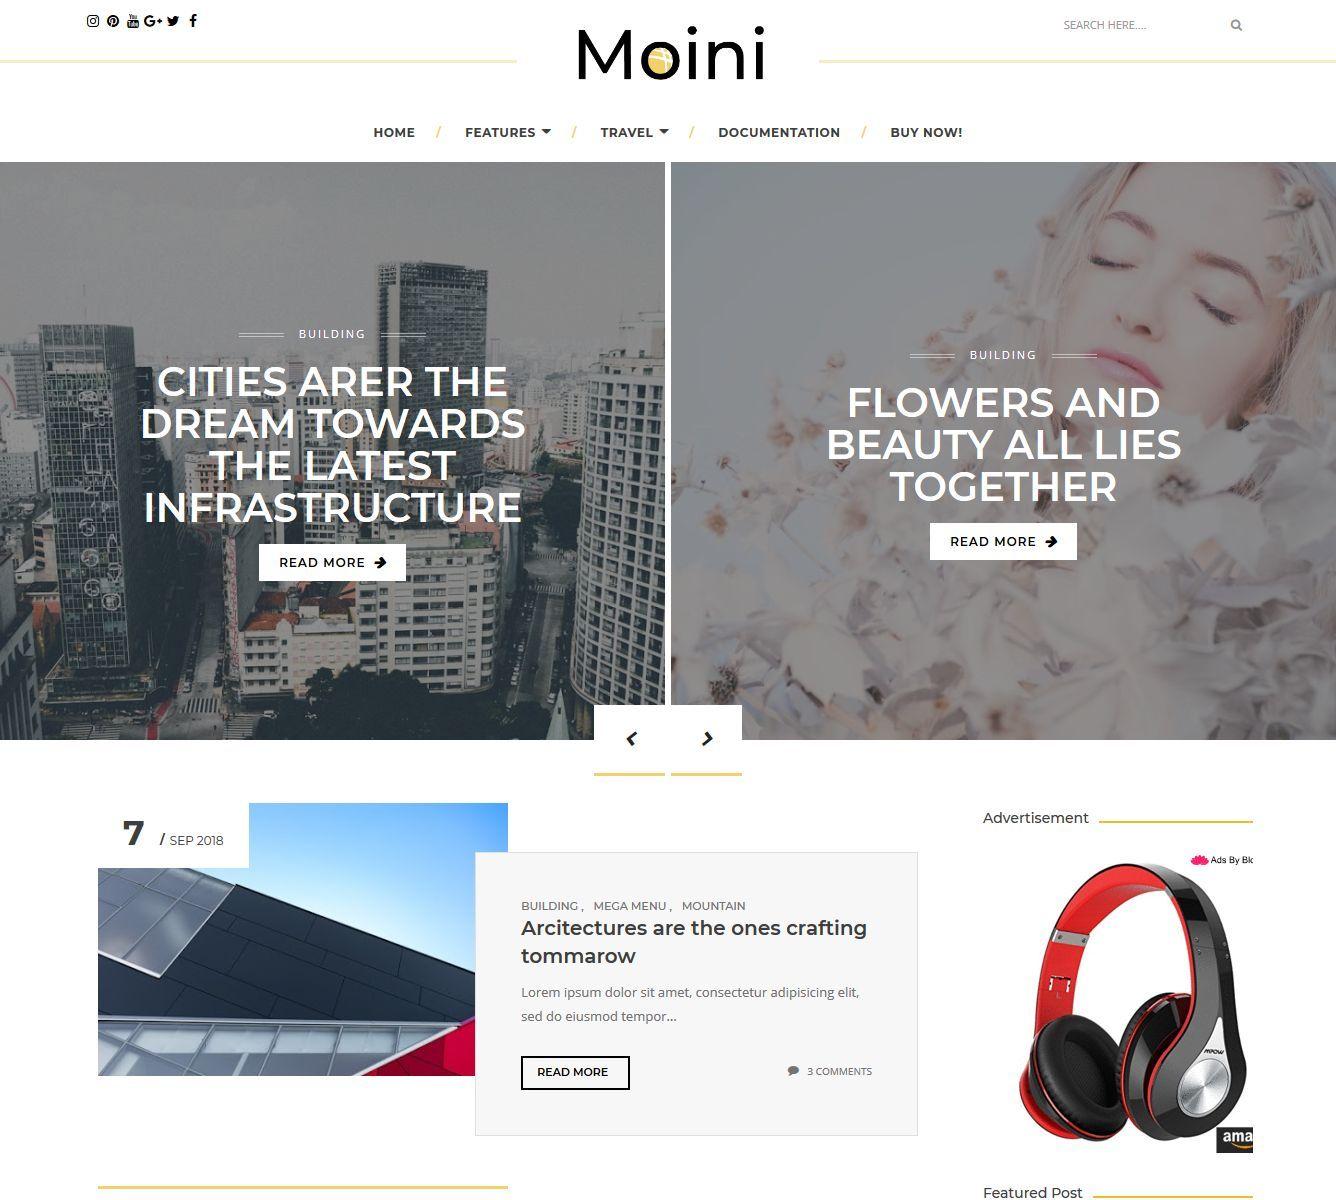 Moini Blogger Theme Free Blogger Themes Premium Blogger Themes Premium Blogger Themes Download Free In 2020 Blogger Themes Free Blogger Templates Blogger Templates